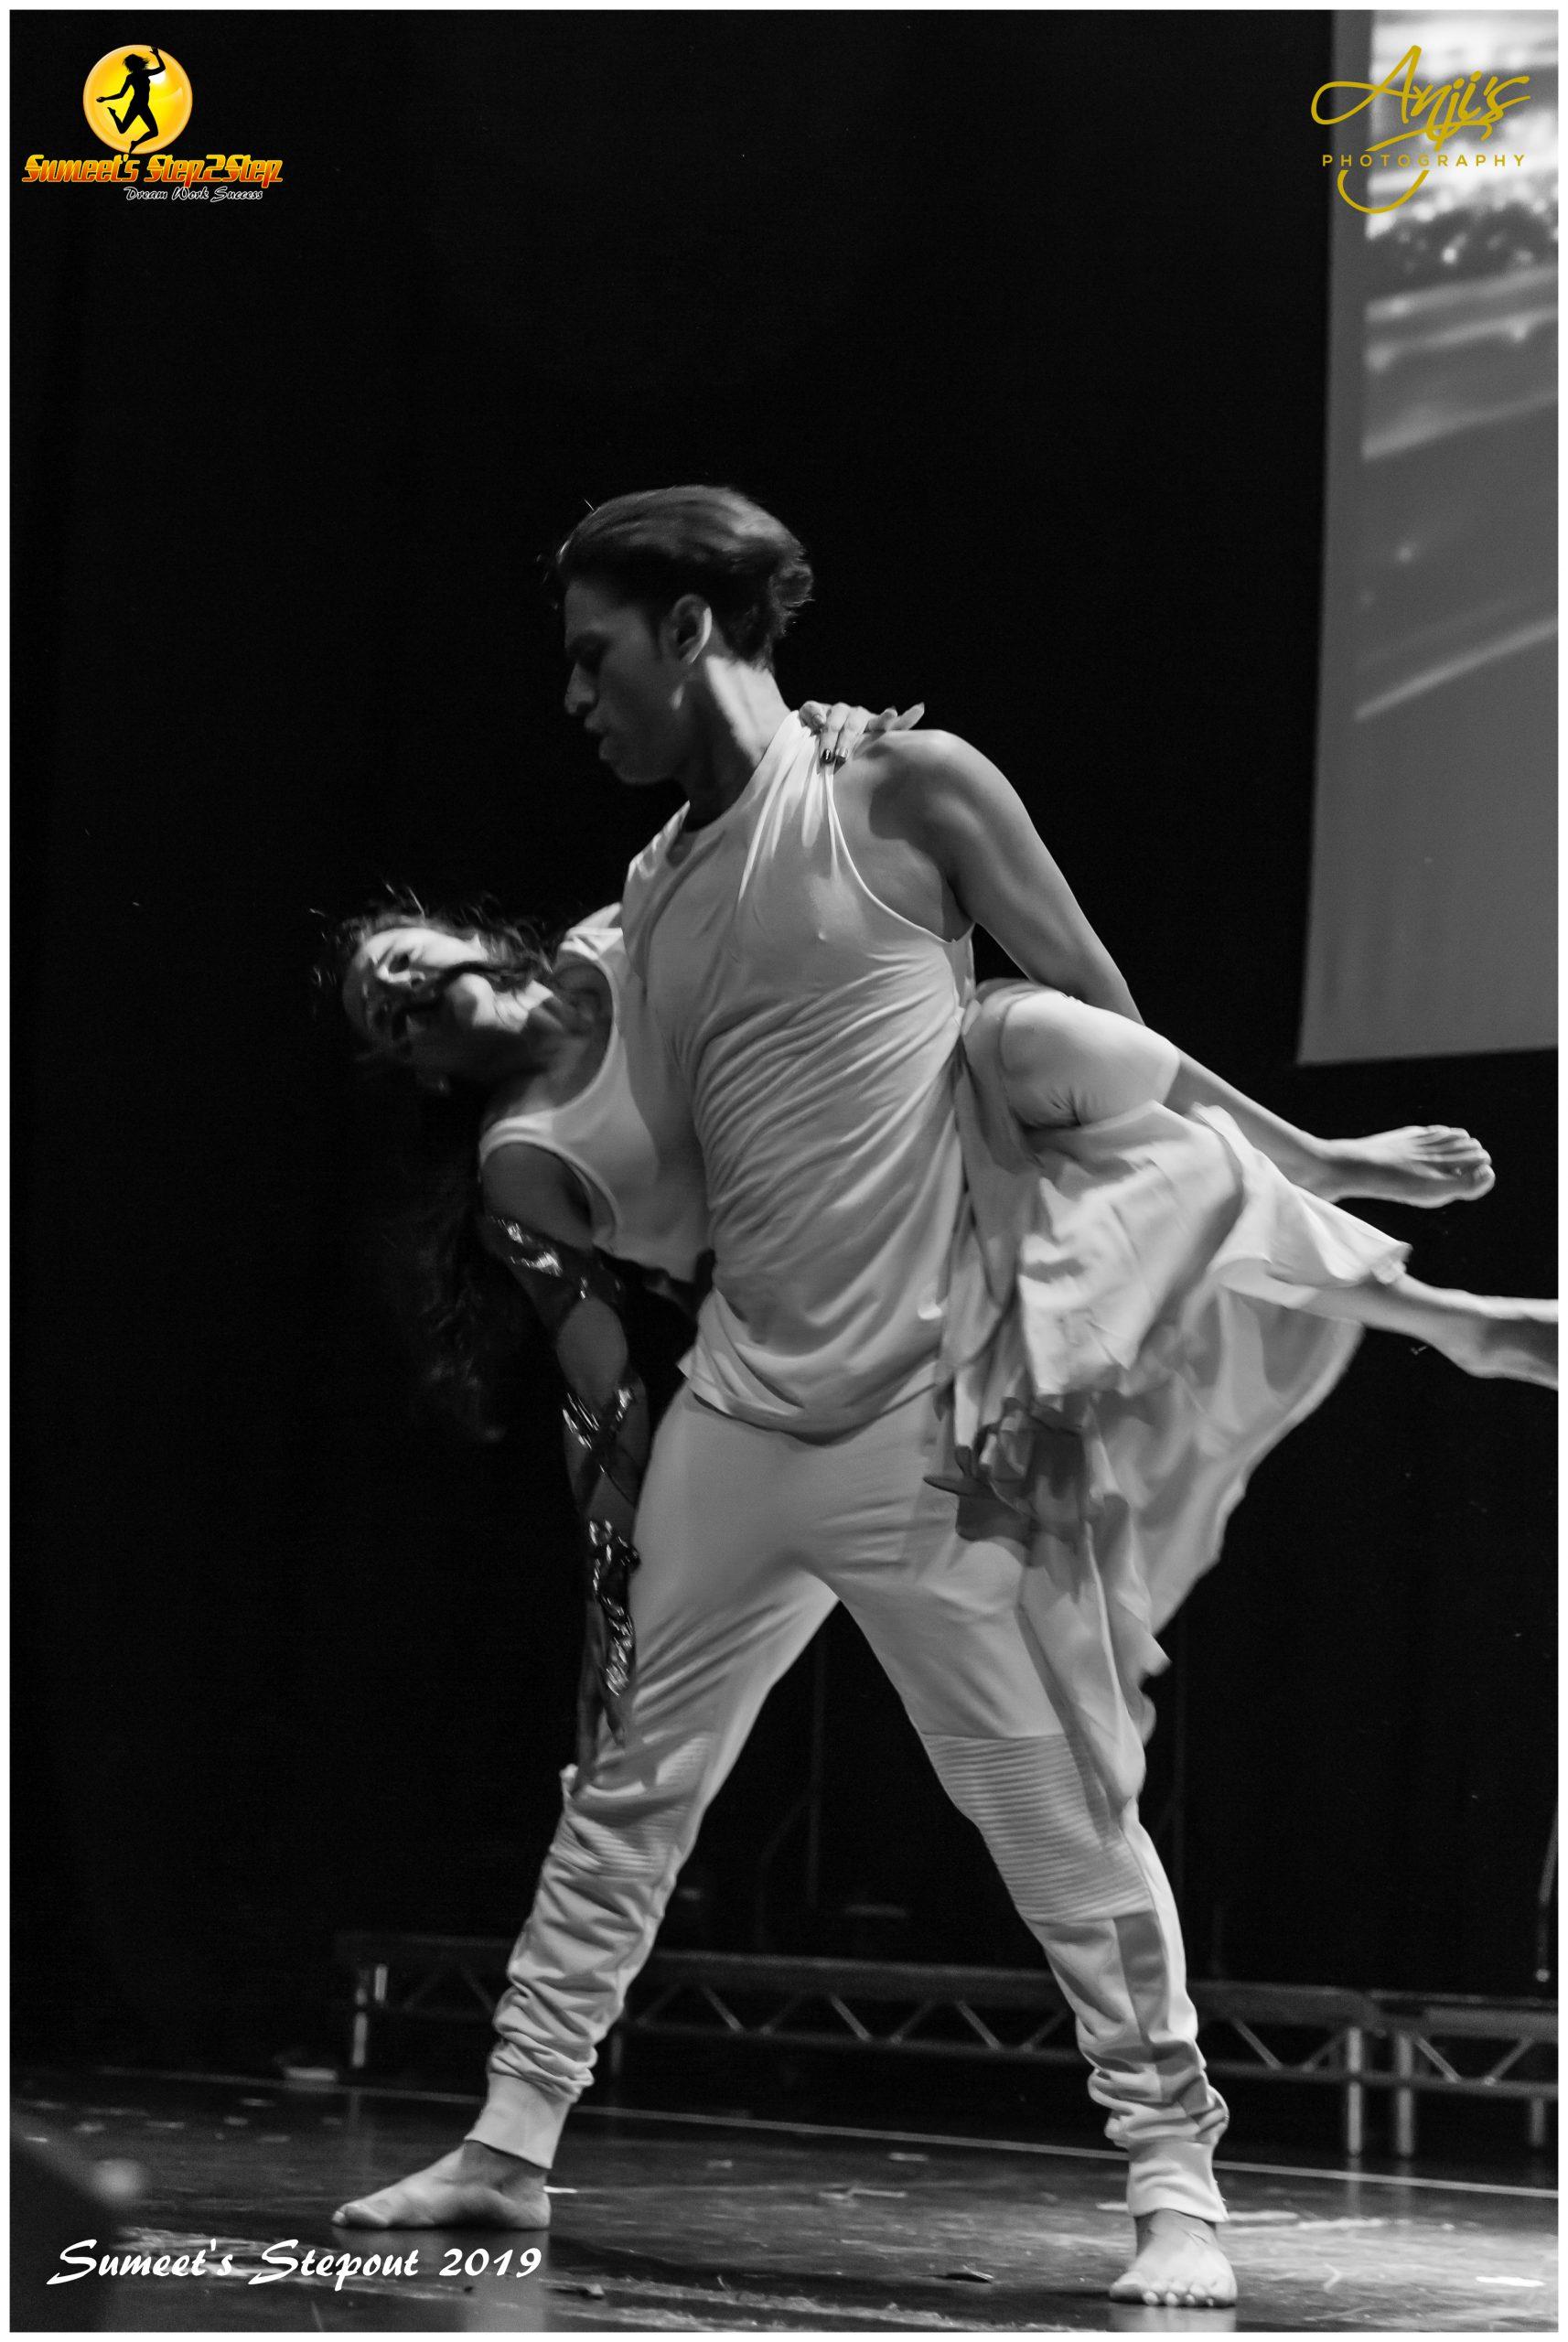 Anerley bollywood dance